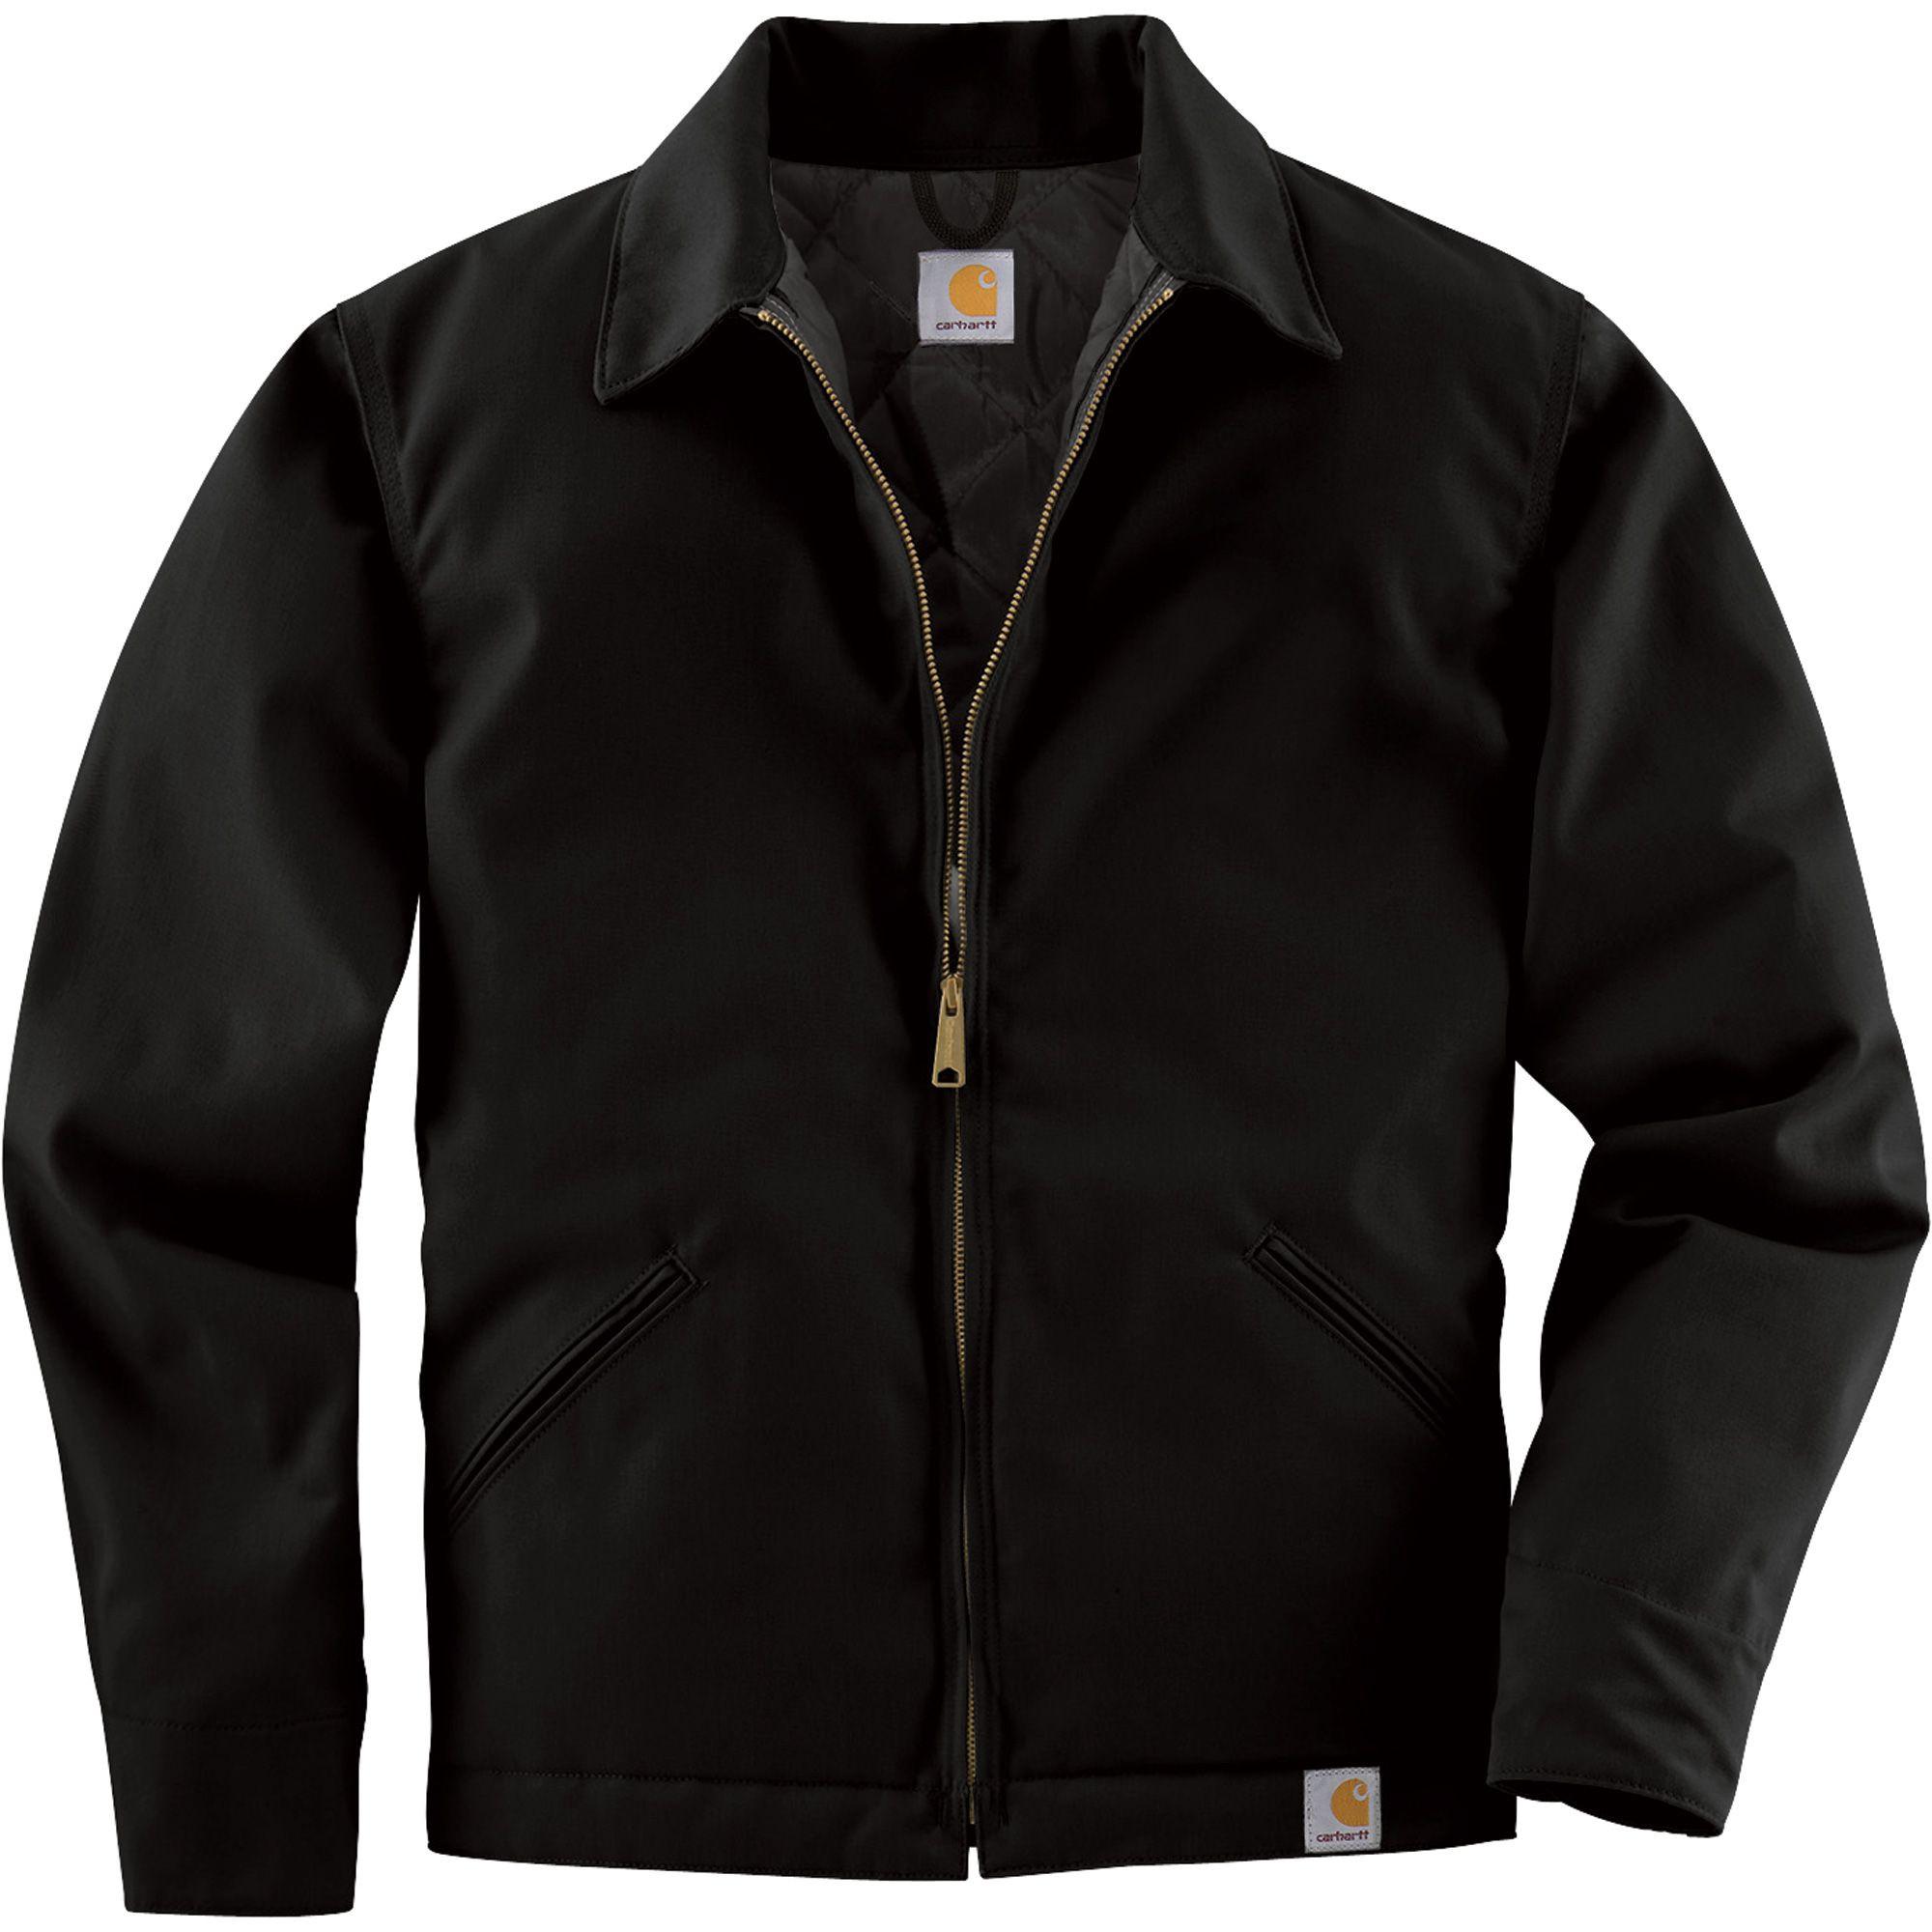 Куртка Carhartt Twill Work Jacket - J293 (Black, M)